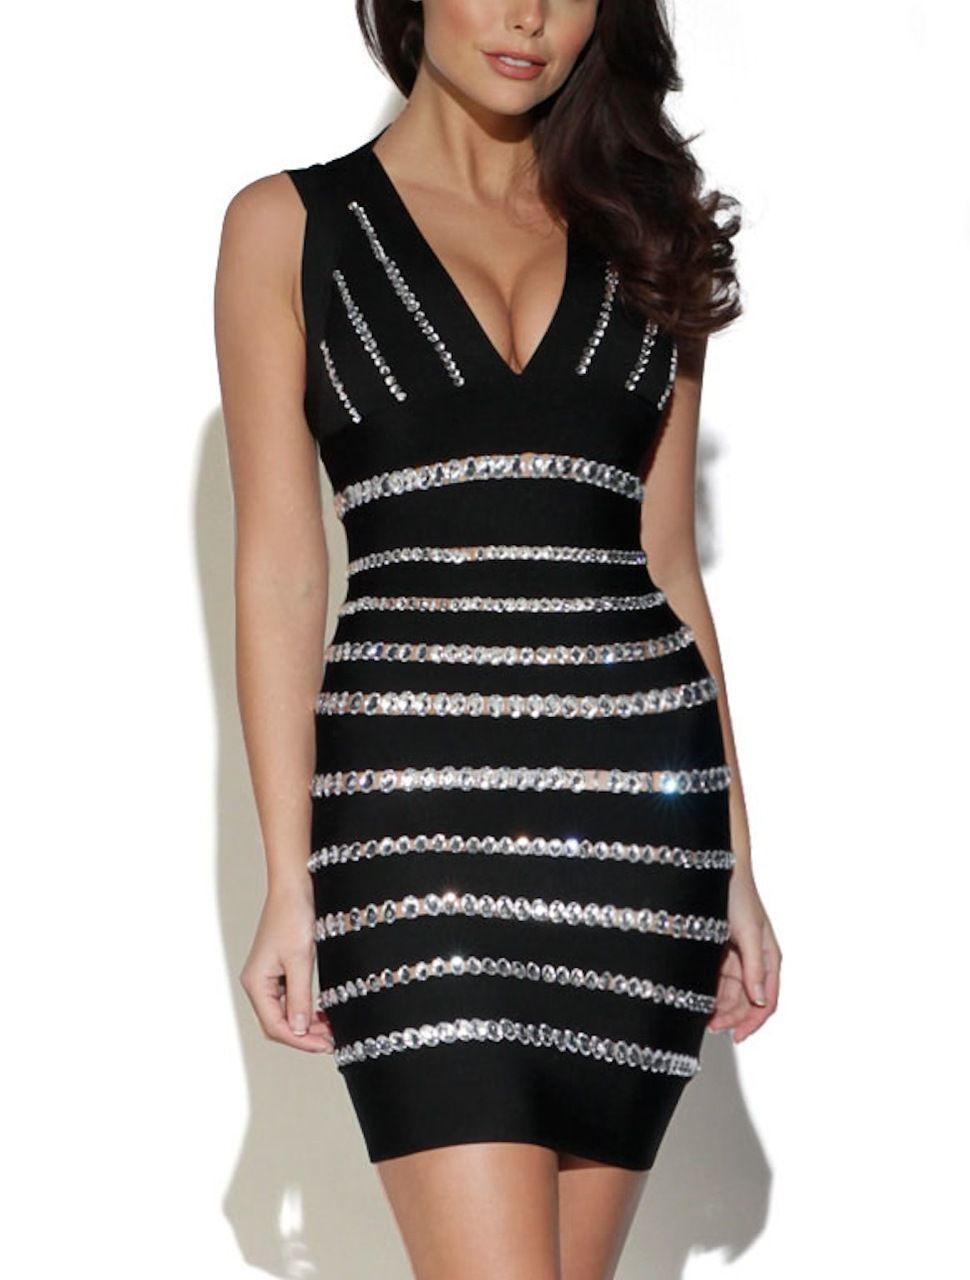 Crystals and sparkles bella moda beauty pinterest dresses